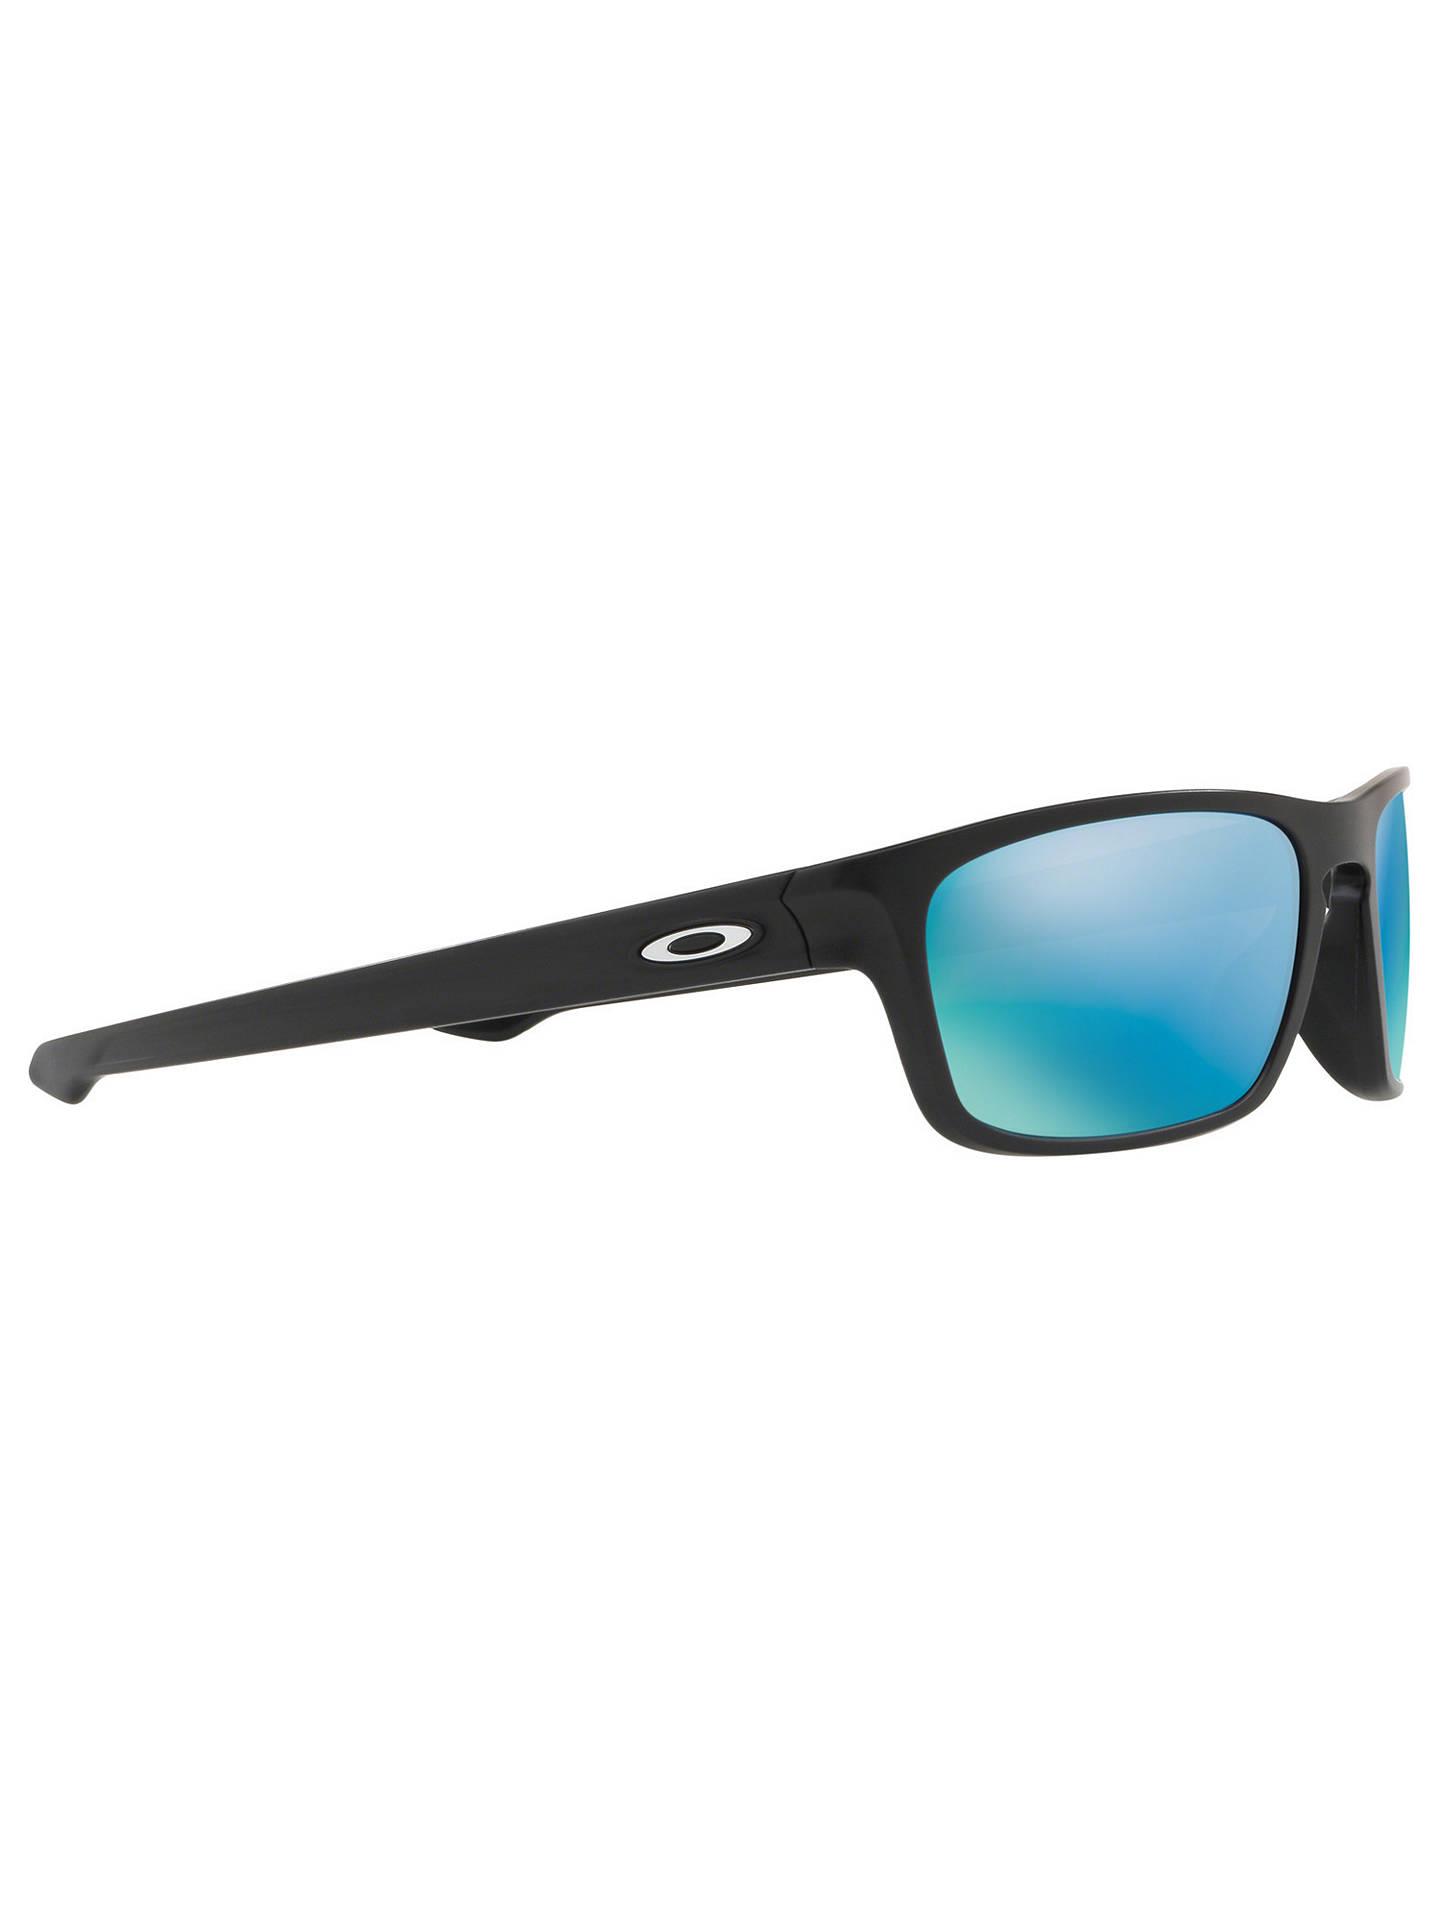 cdf9b86f51303 ... Buy Oakley OO9408 Men s Sliver Stealth Prizm Polarised Rectangular  Sunglasses